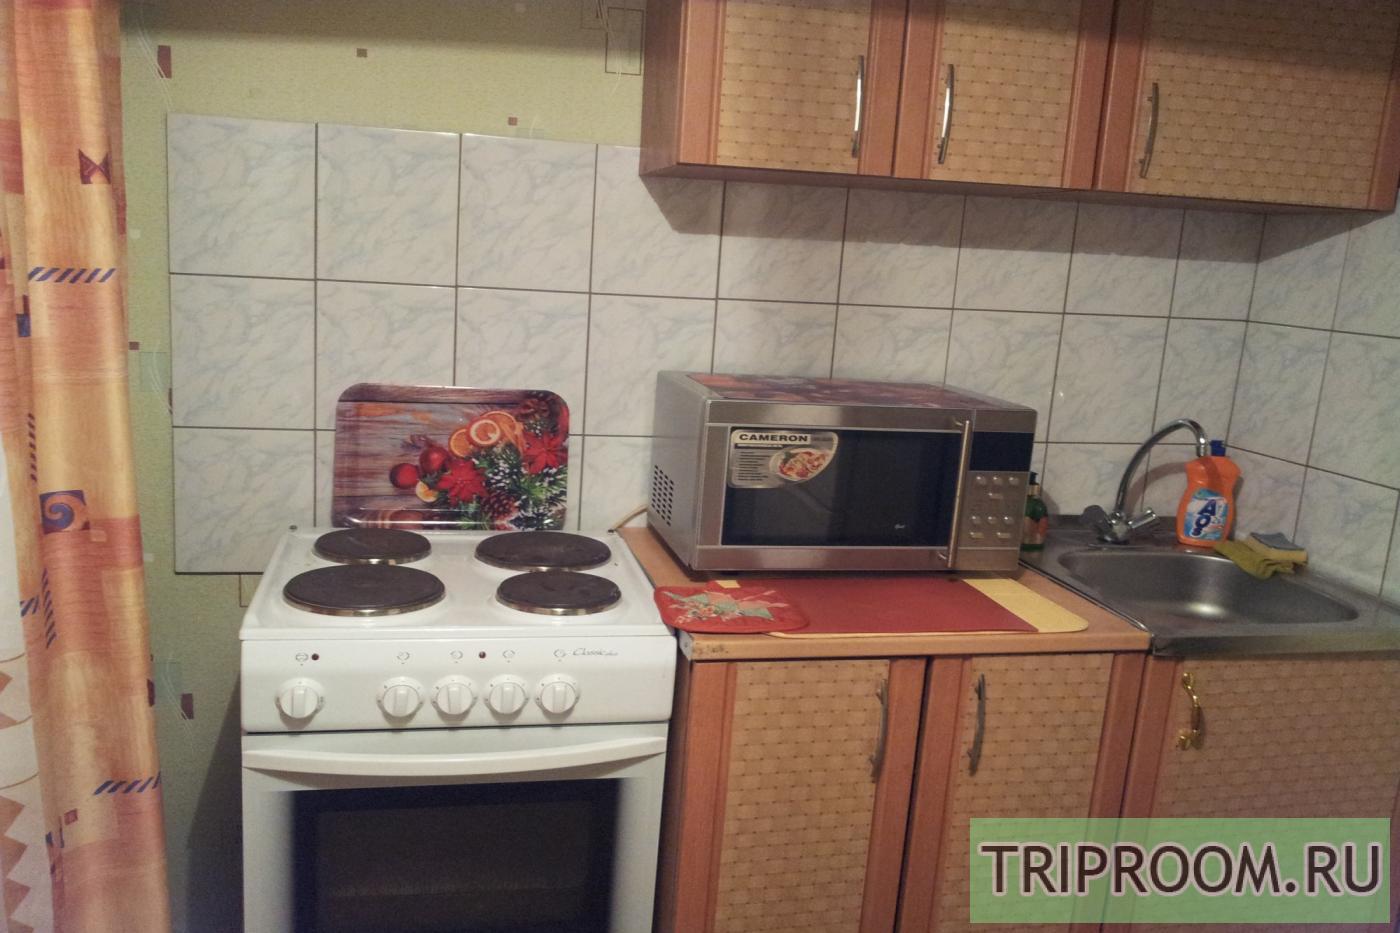 1-комнатная квартира посуточно (вариант № 30851), ул. Циолковского улица, фото № 5